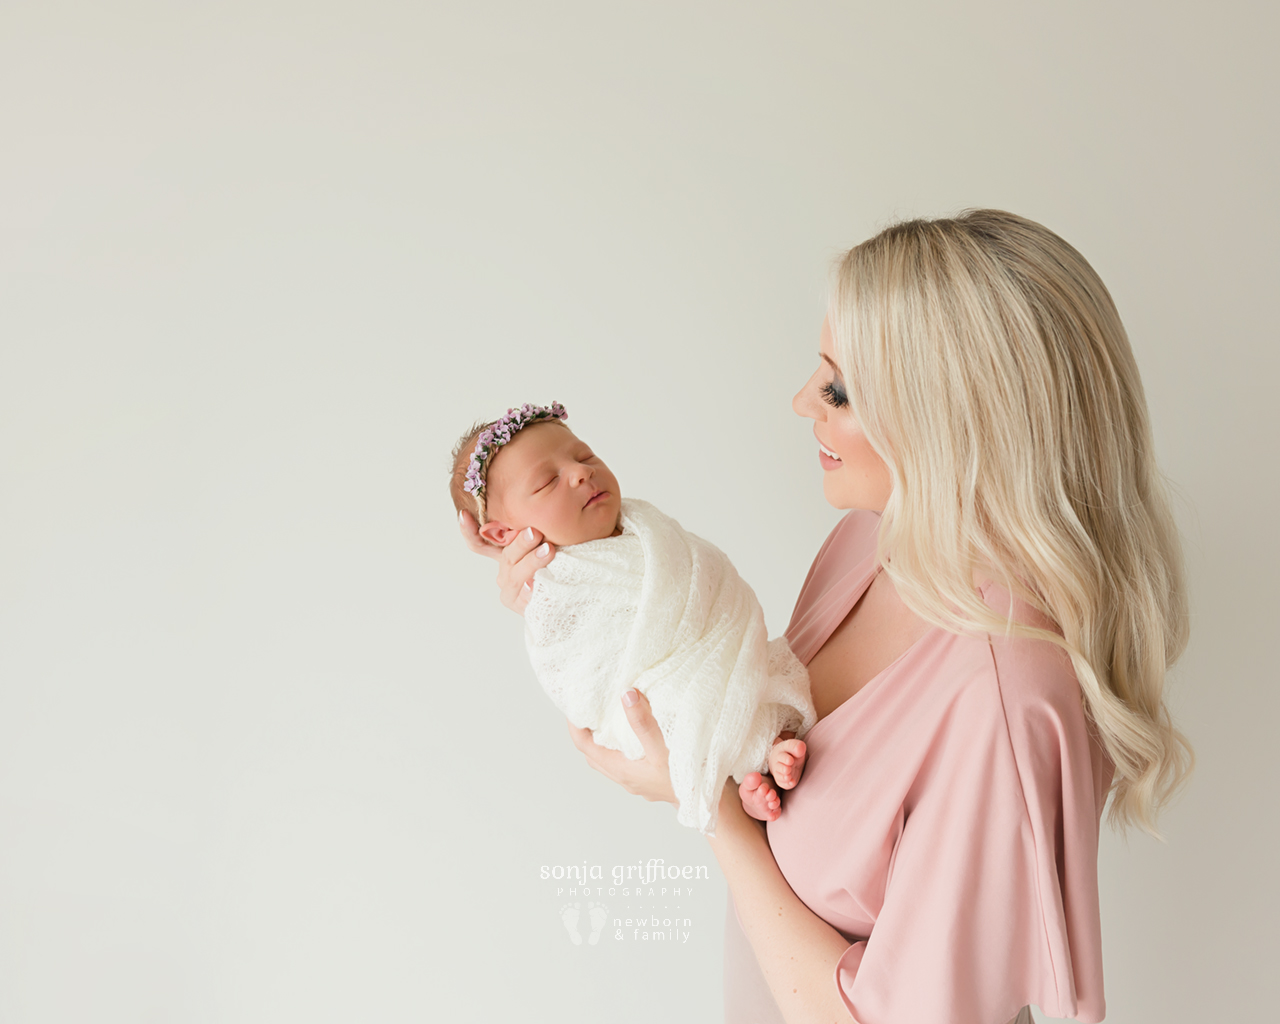 Petra-Newborn-Brisbane-Newborn-Photographer-Sonja-Griffioen-03.jpg